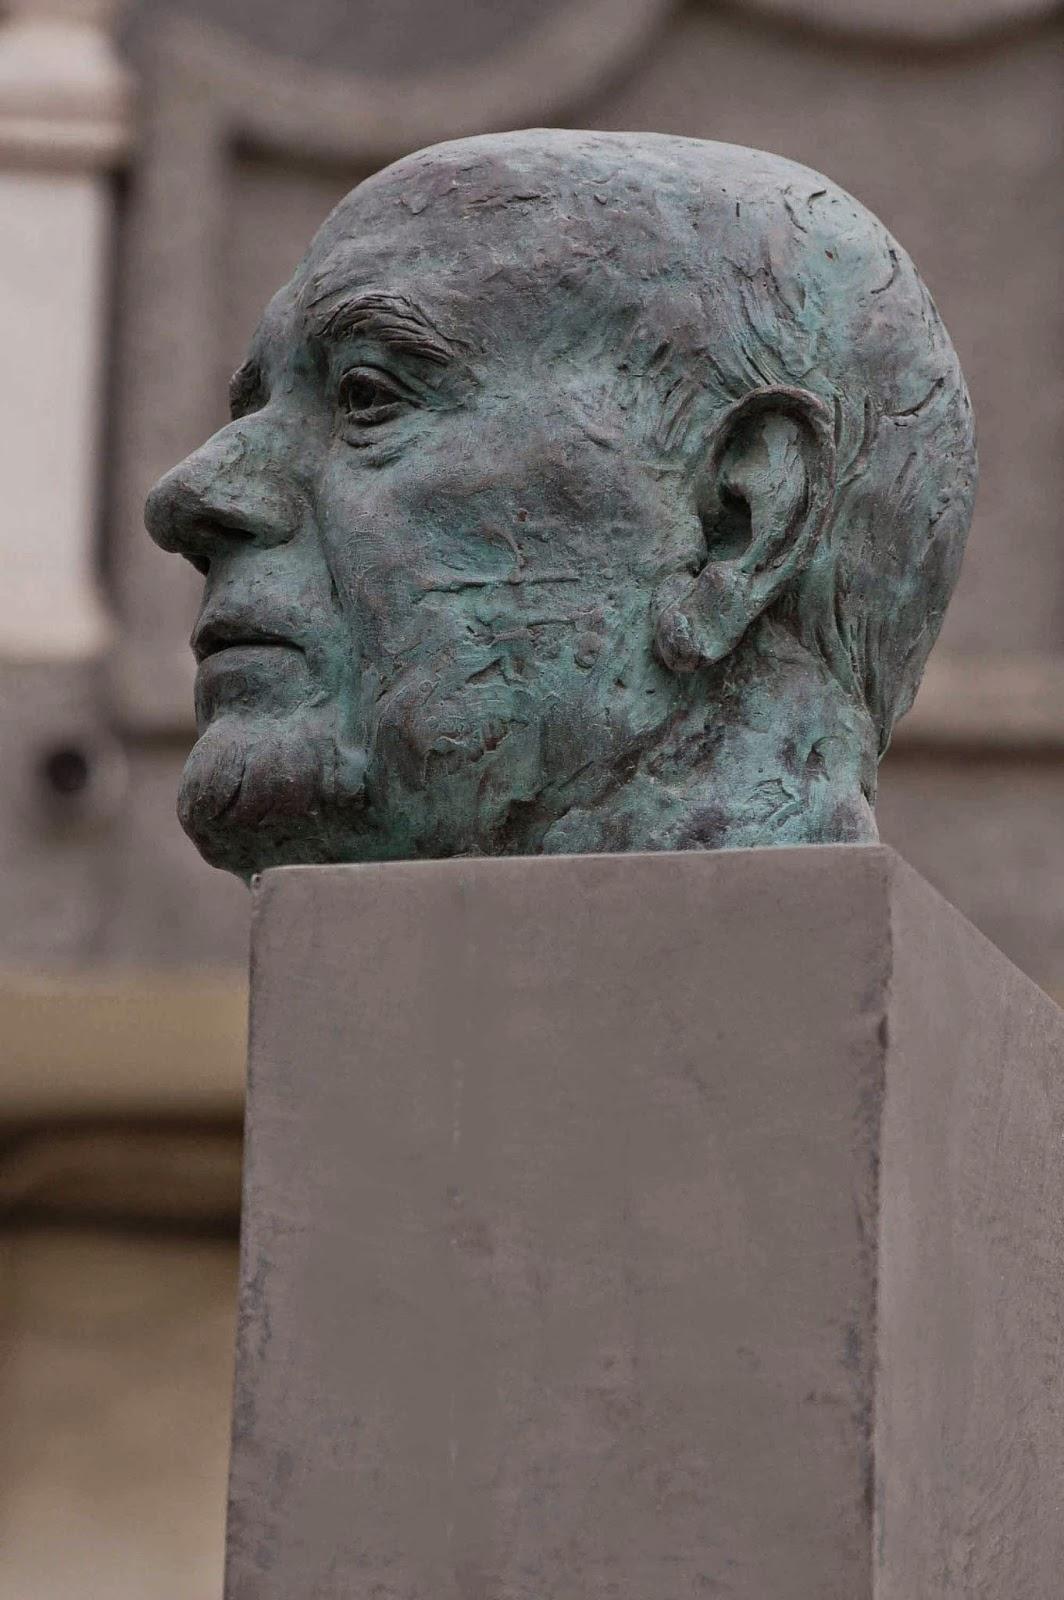 Monumento bronce Fuente Álamo Murcia Arturo Serra escultura 4